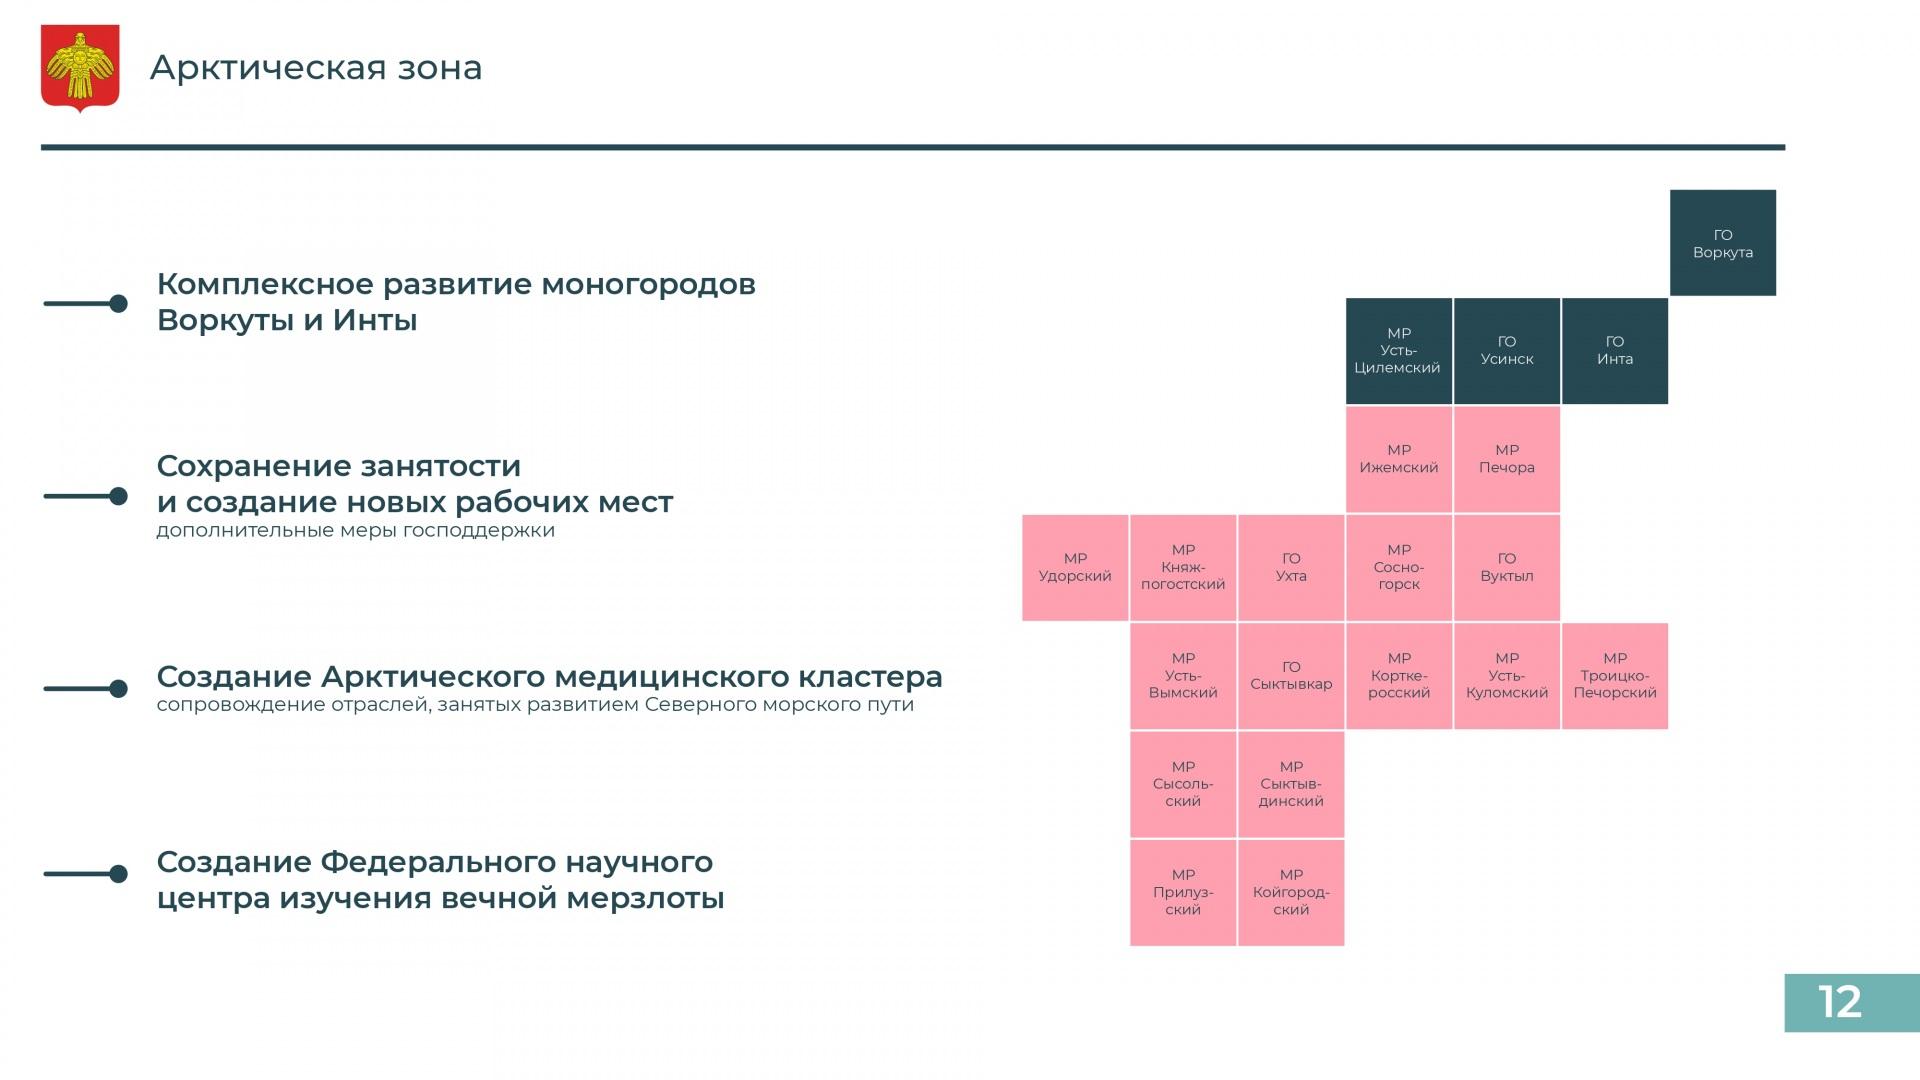 Doklad_Glavy_2021_page-0012.jpg